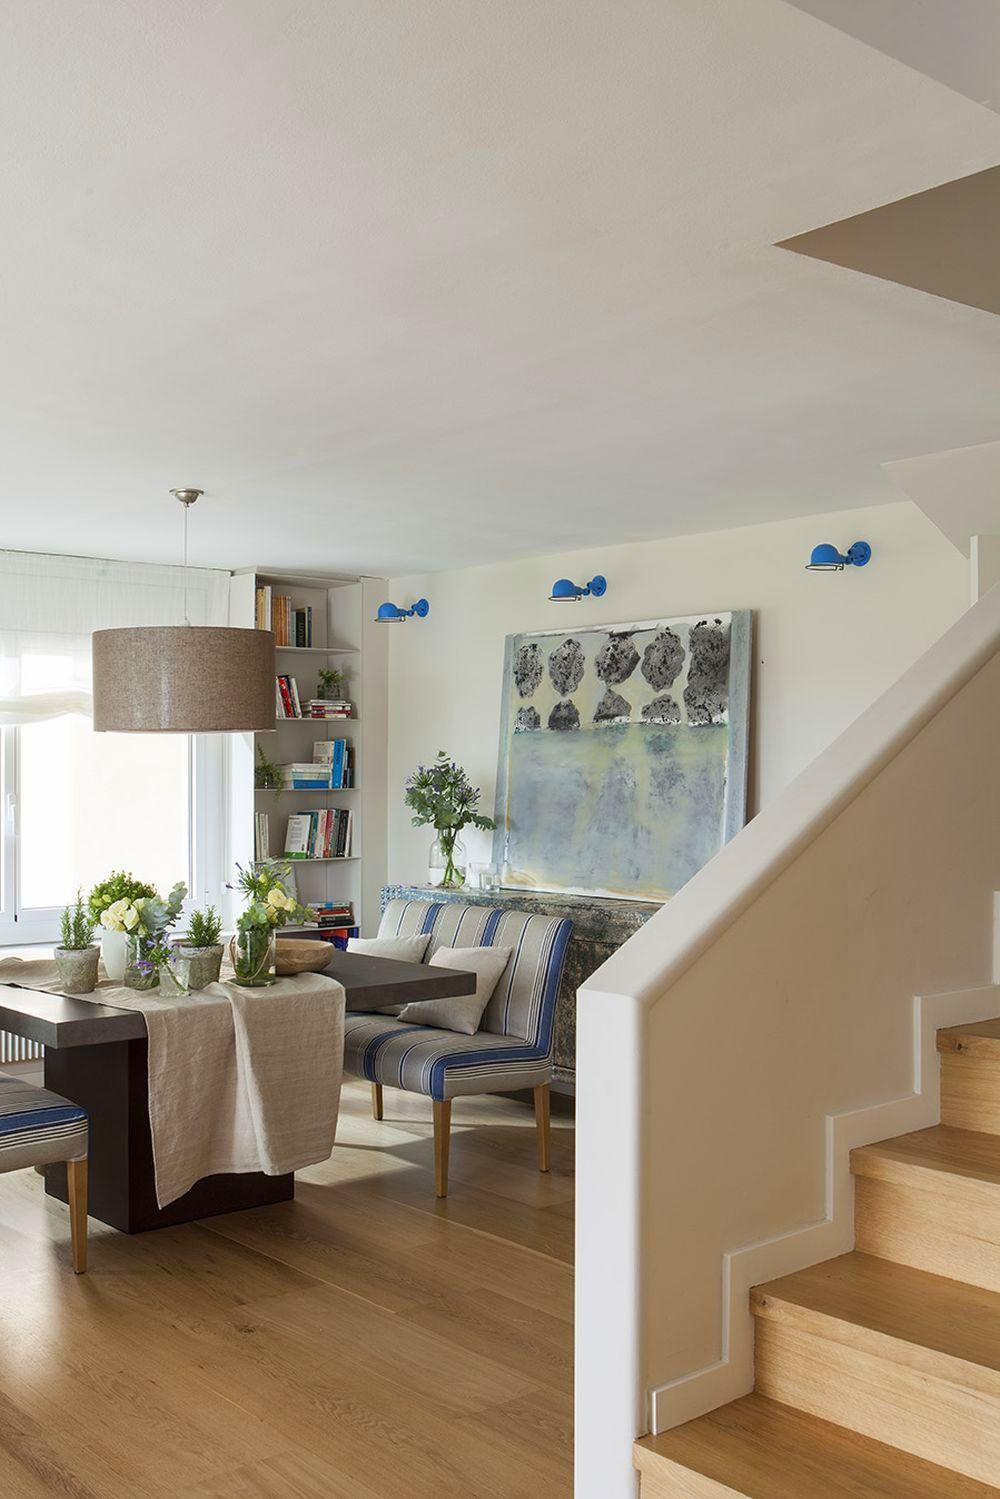 adelaparvu.com despre casa cu gradina, accente marine, designer Jeanette Dresing, Foto Feran Freixa (7)